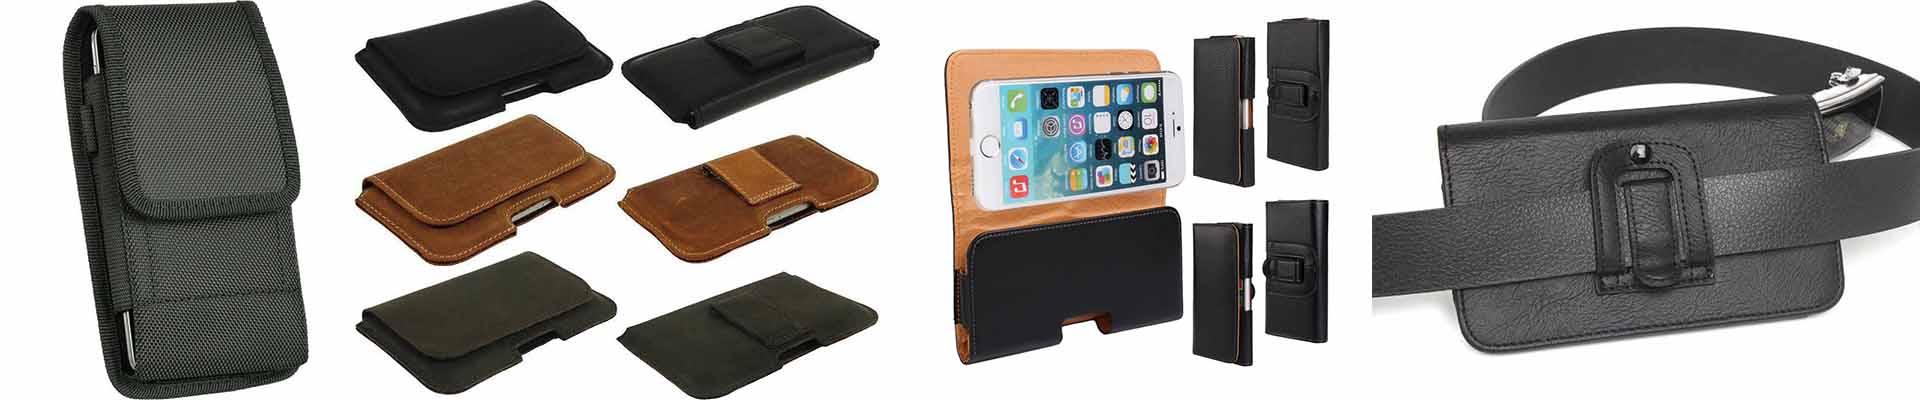 Gürtelholster-Taschen-handy-case-huelle-iPhone